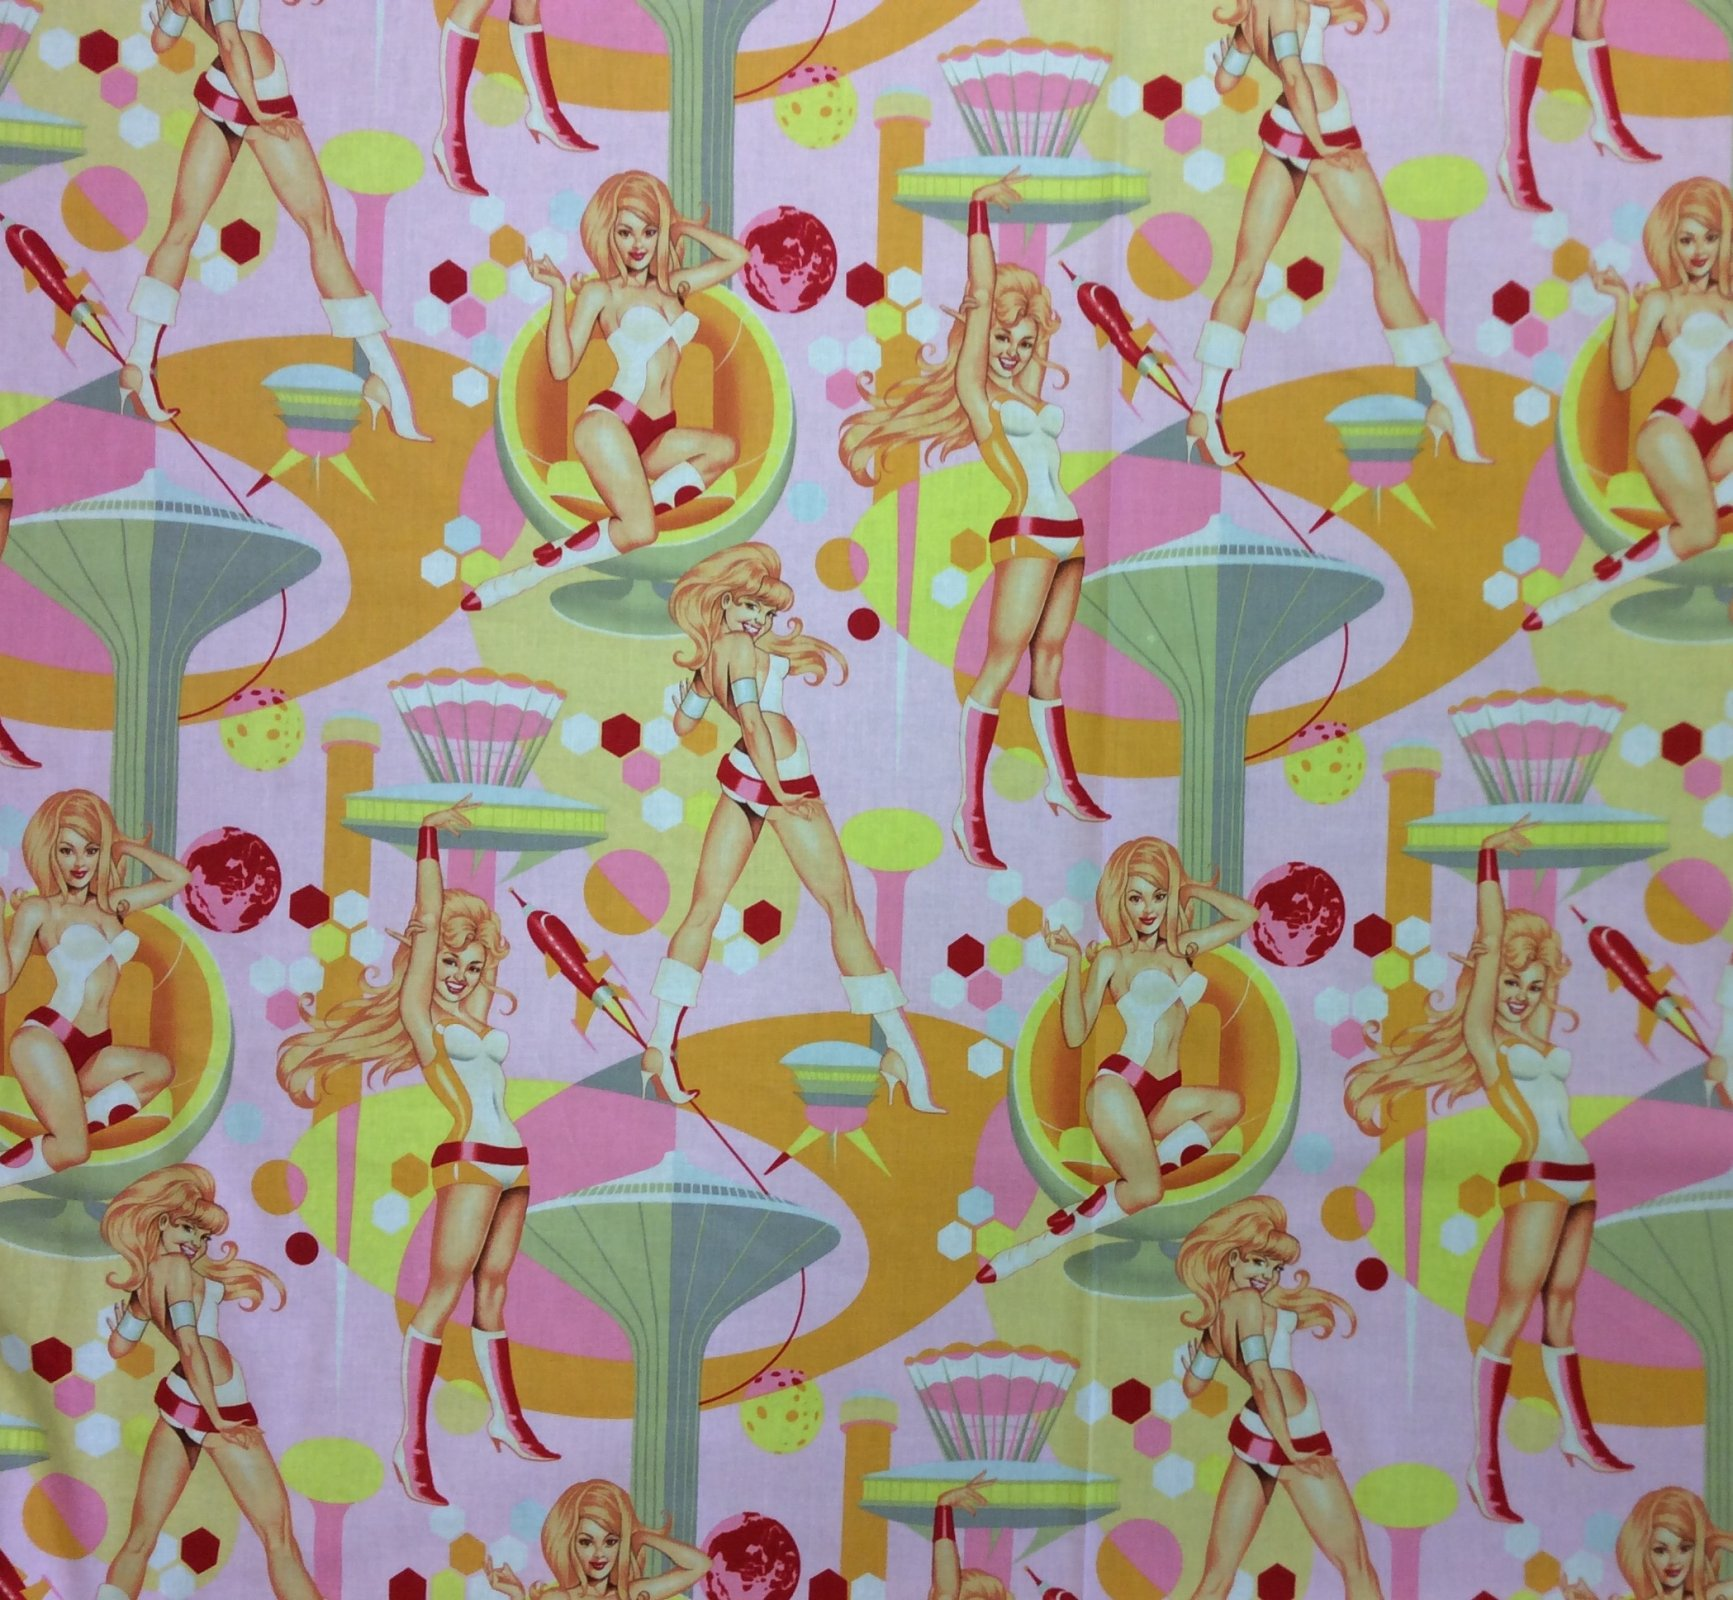 Sexy Pin Up Girls Retro Futurella Alexander Henry Cotton Quilt Fabric AH245